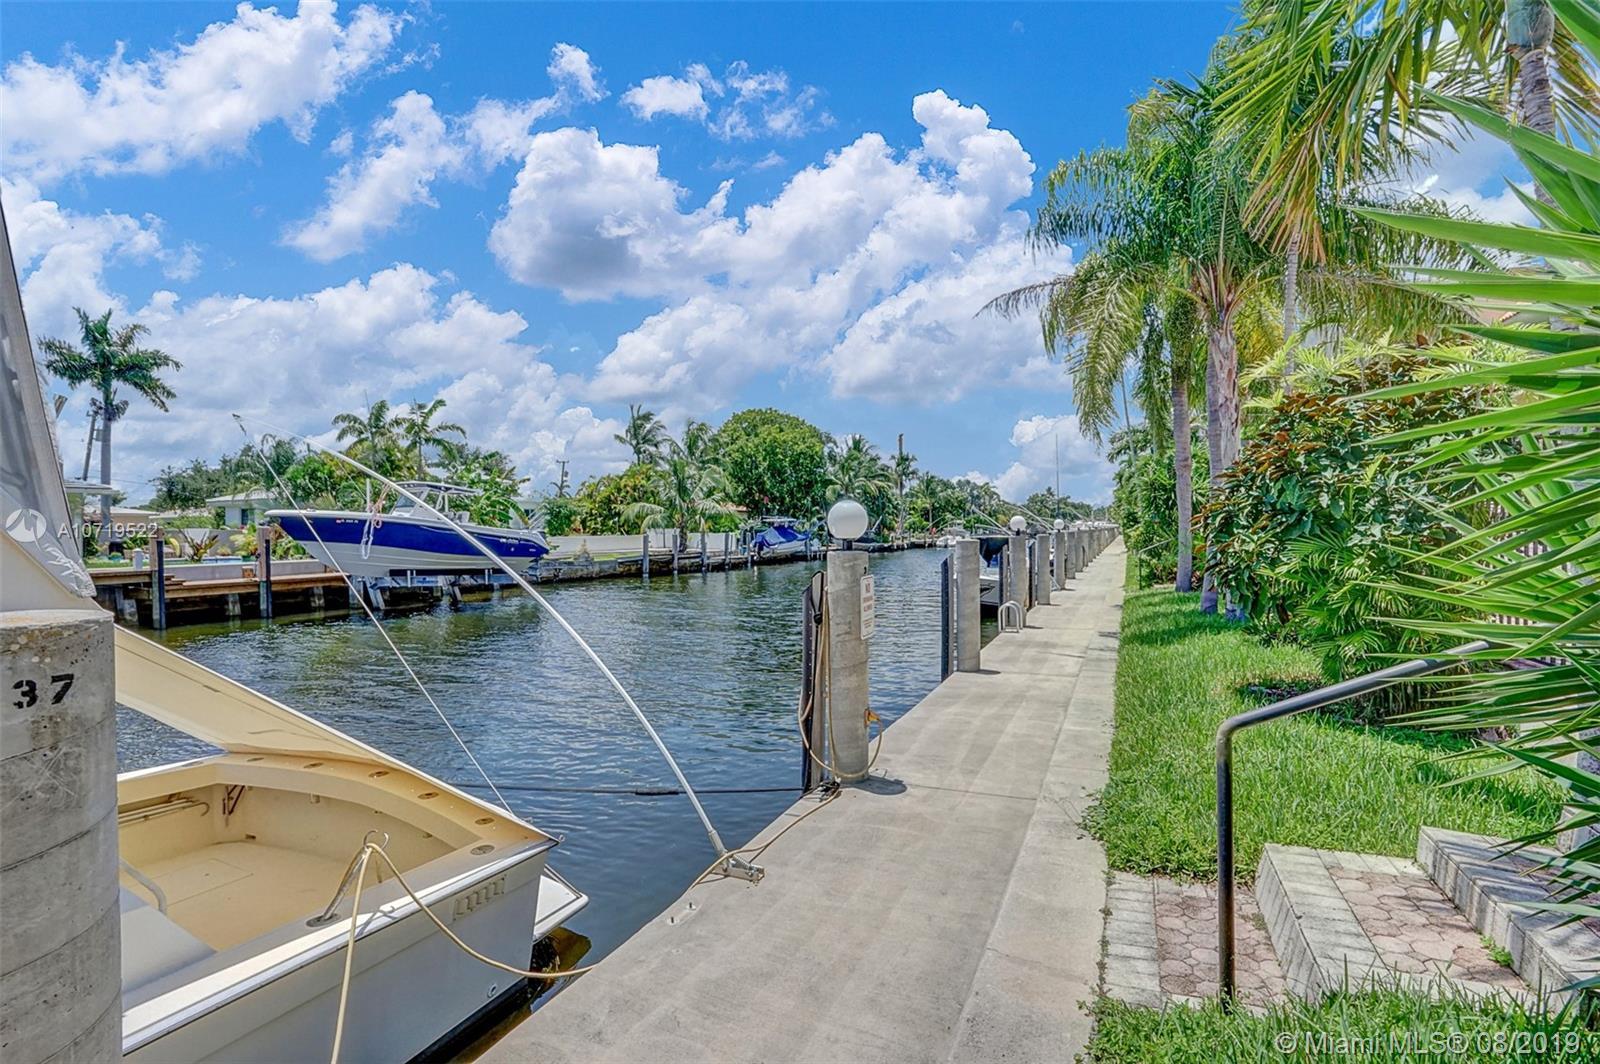 Miami Shores #B-12 - 40 - photo